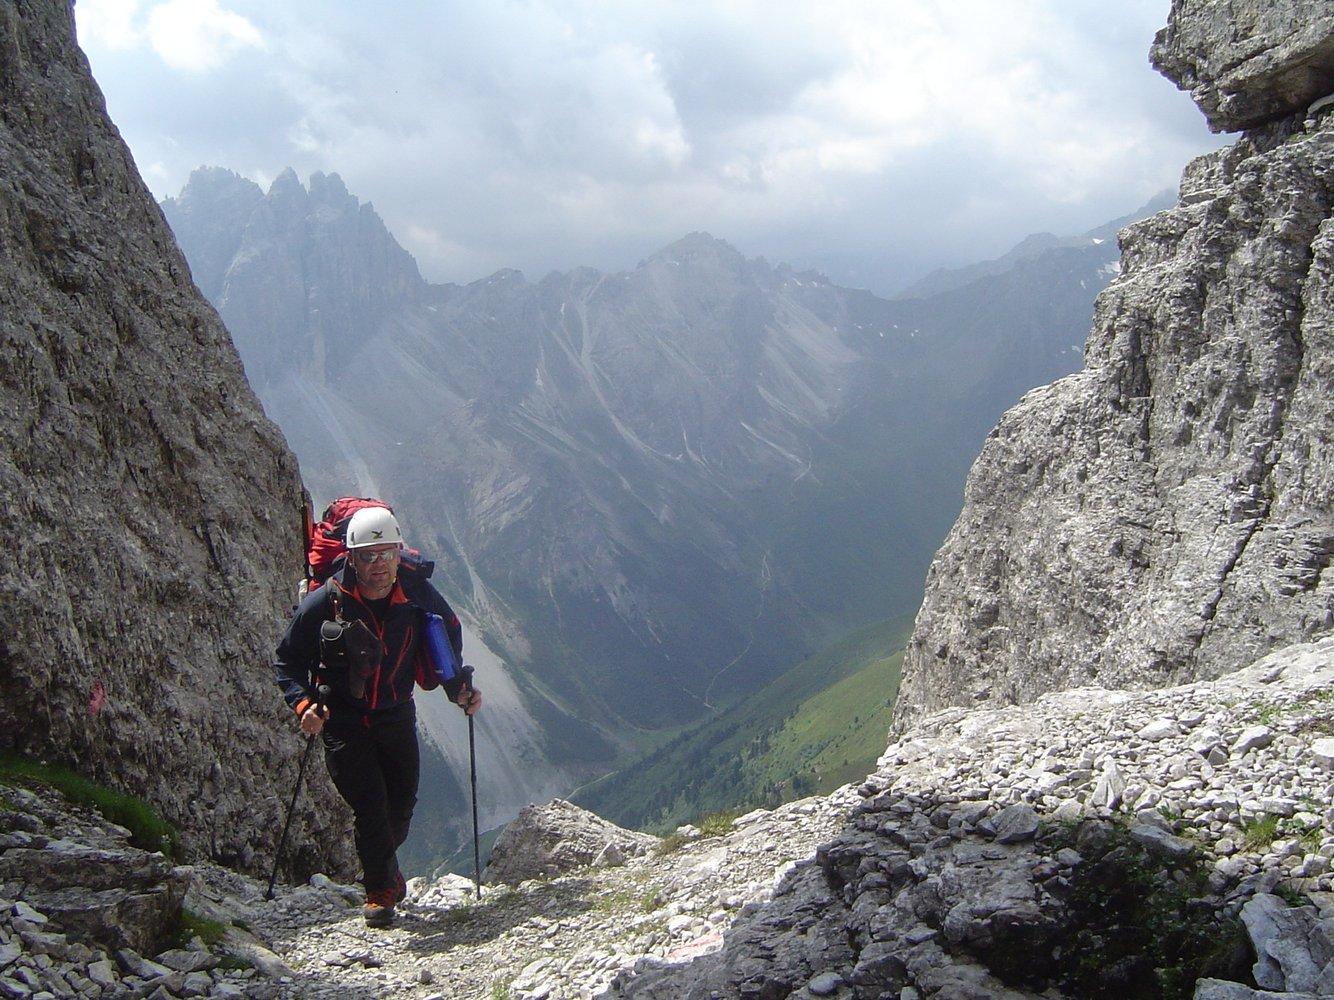 Klettersteig Ilmspitze : Ilmspitze klettersteig bergsteigen